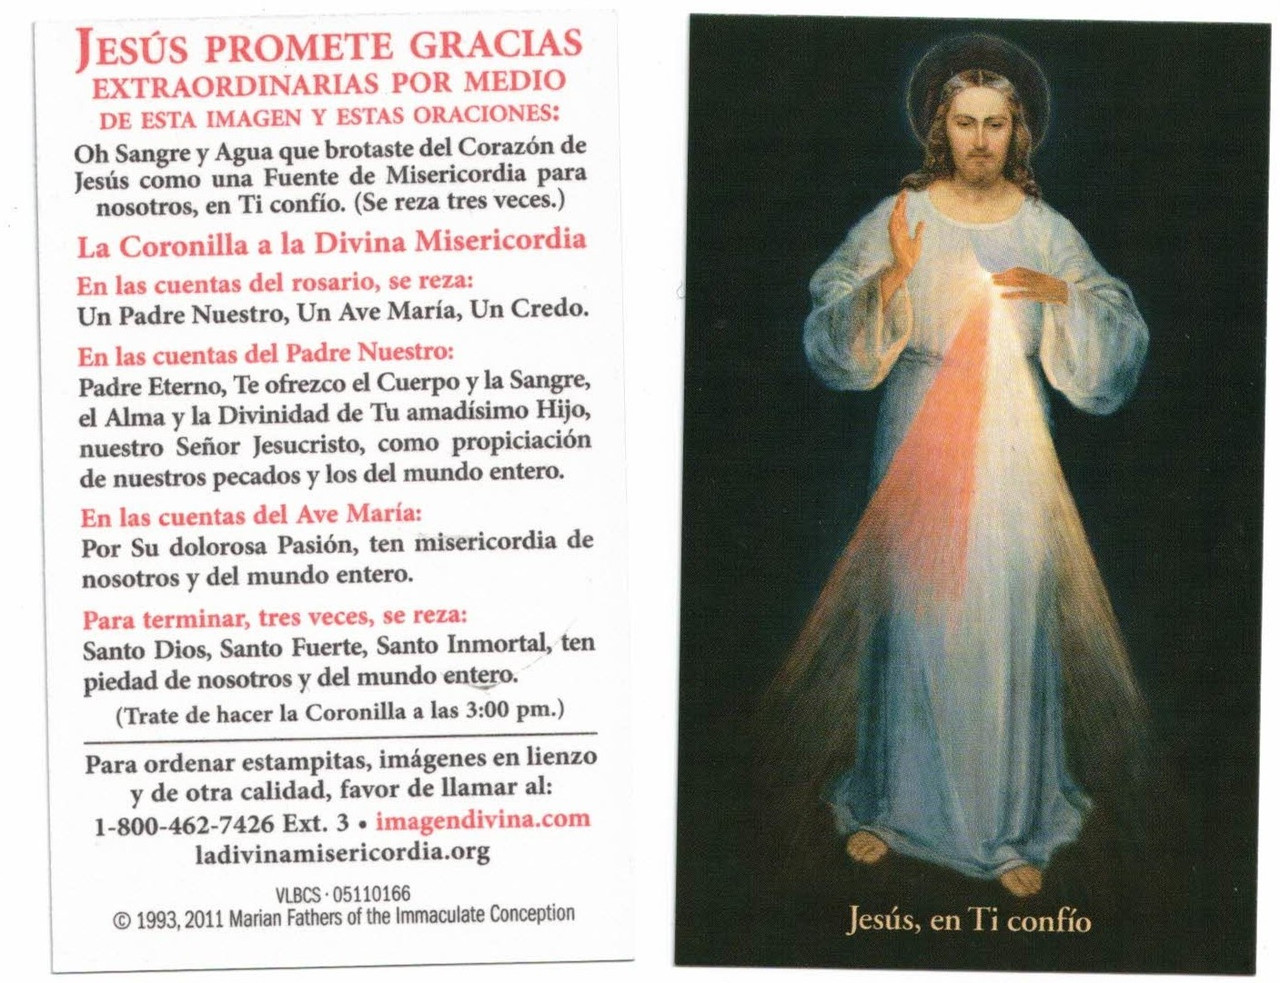 Inexpensive Divine Mercy Chaplet Prayer Card, black background Vilnius Image, Spanish